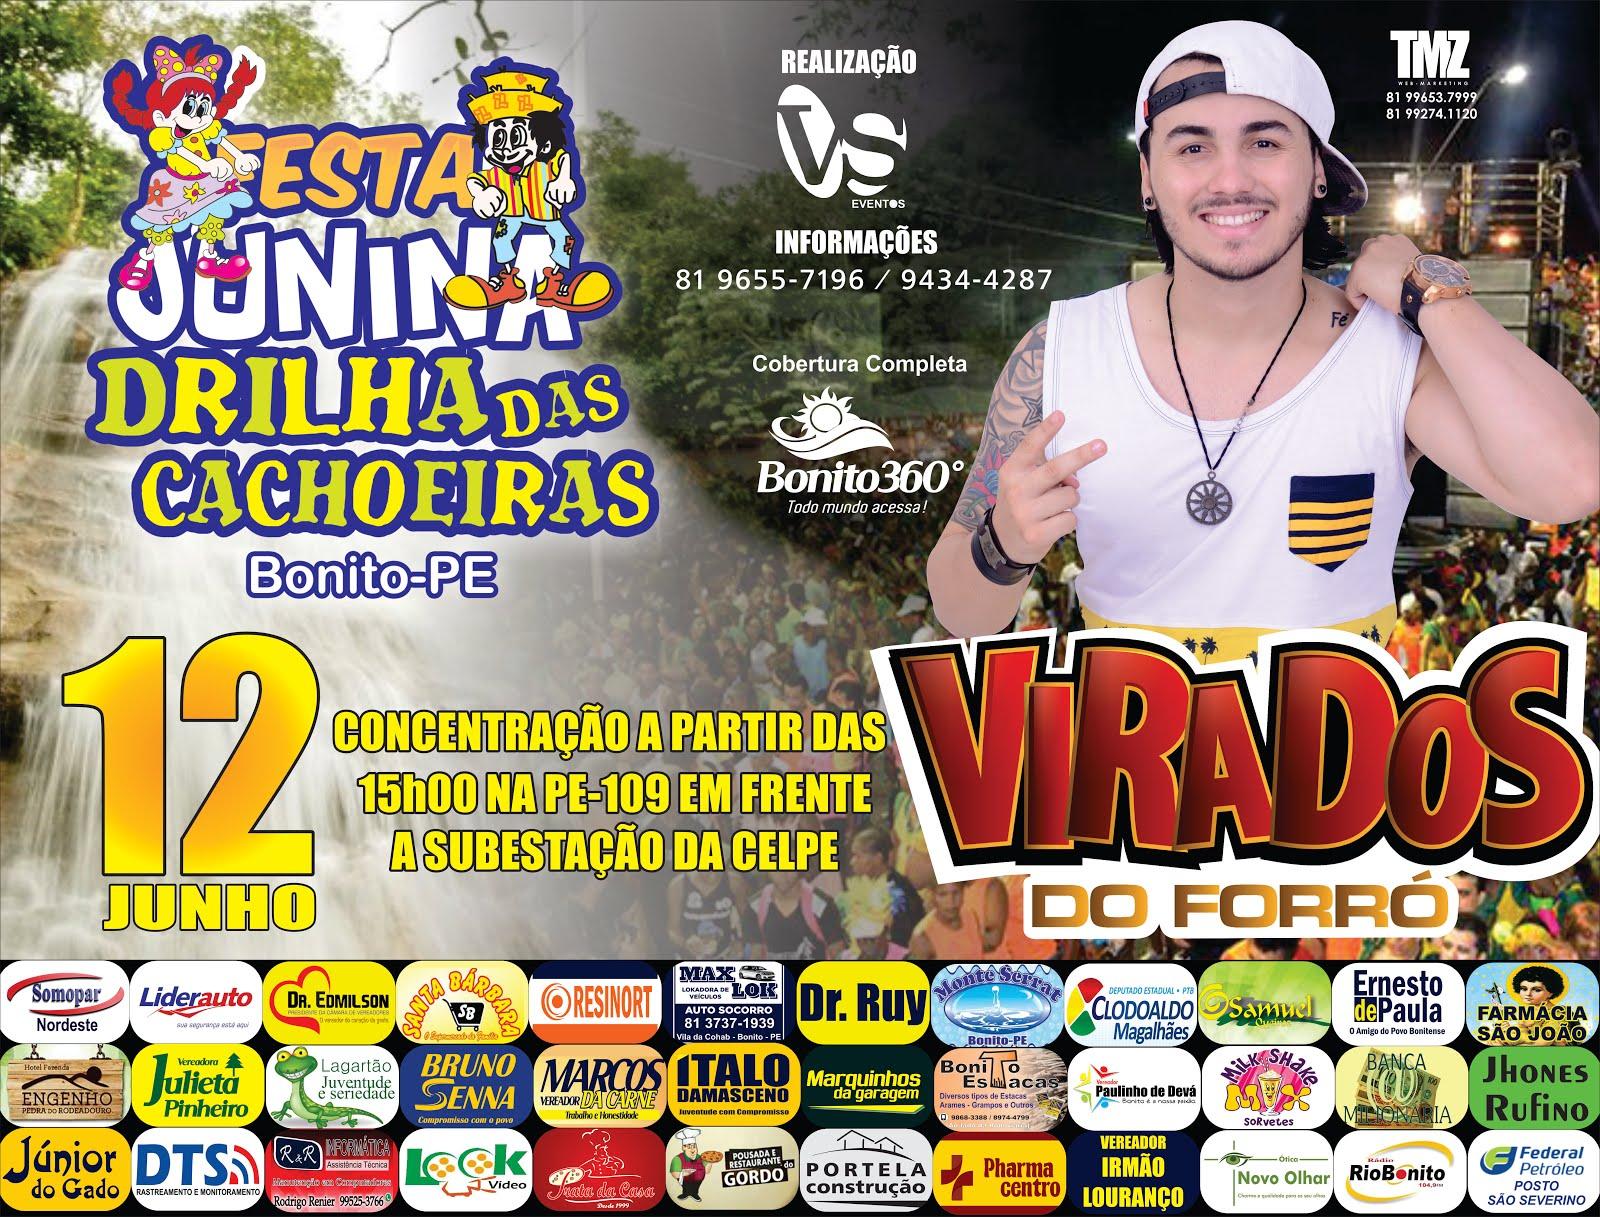 DRILHA DAS CACHOEIRAS - 12 DE JUNHO